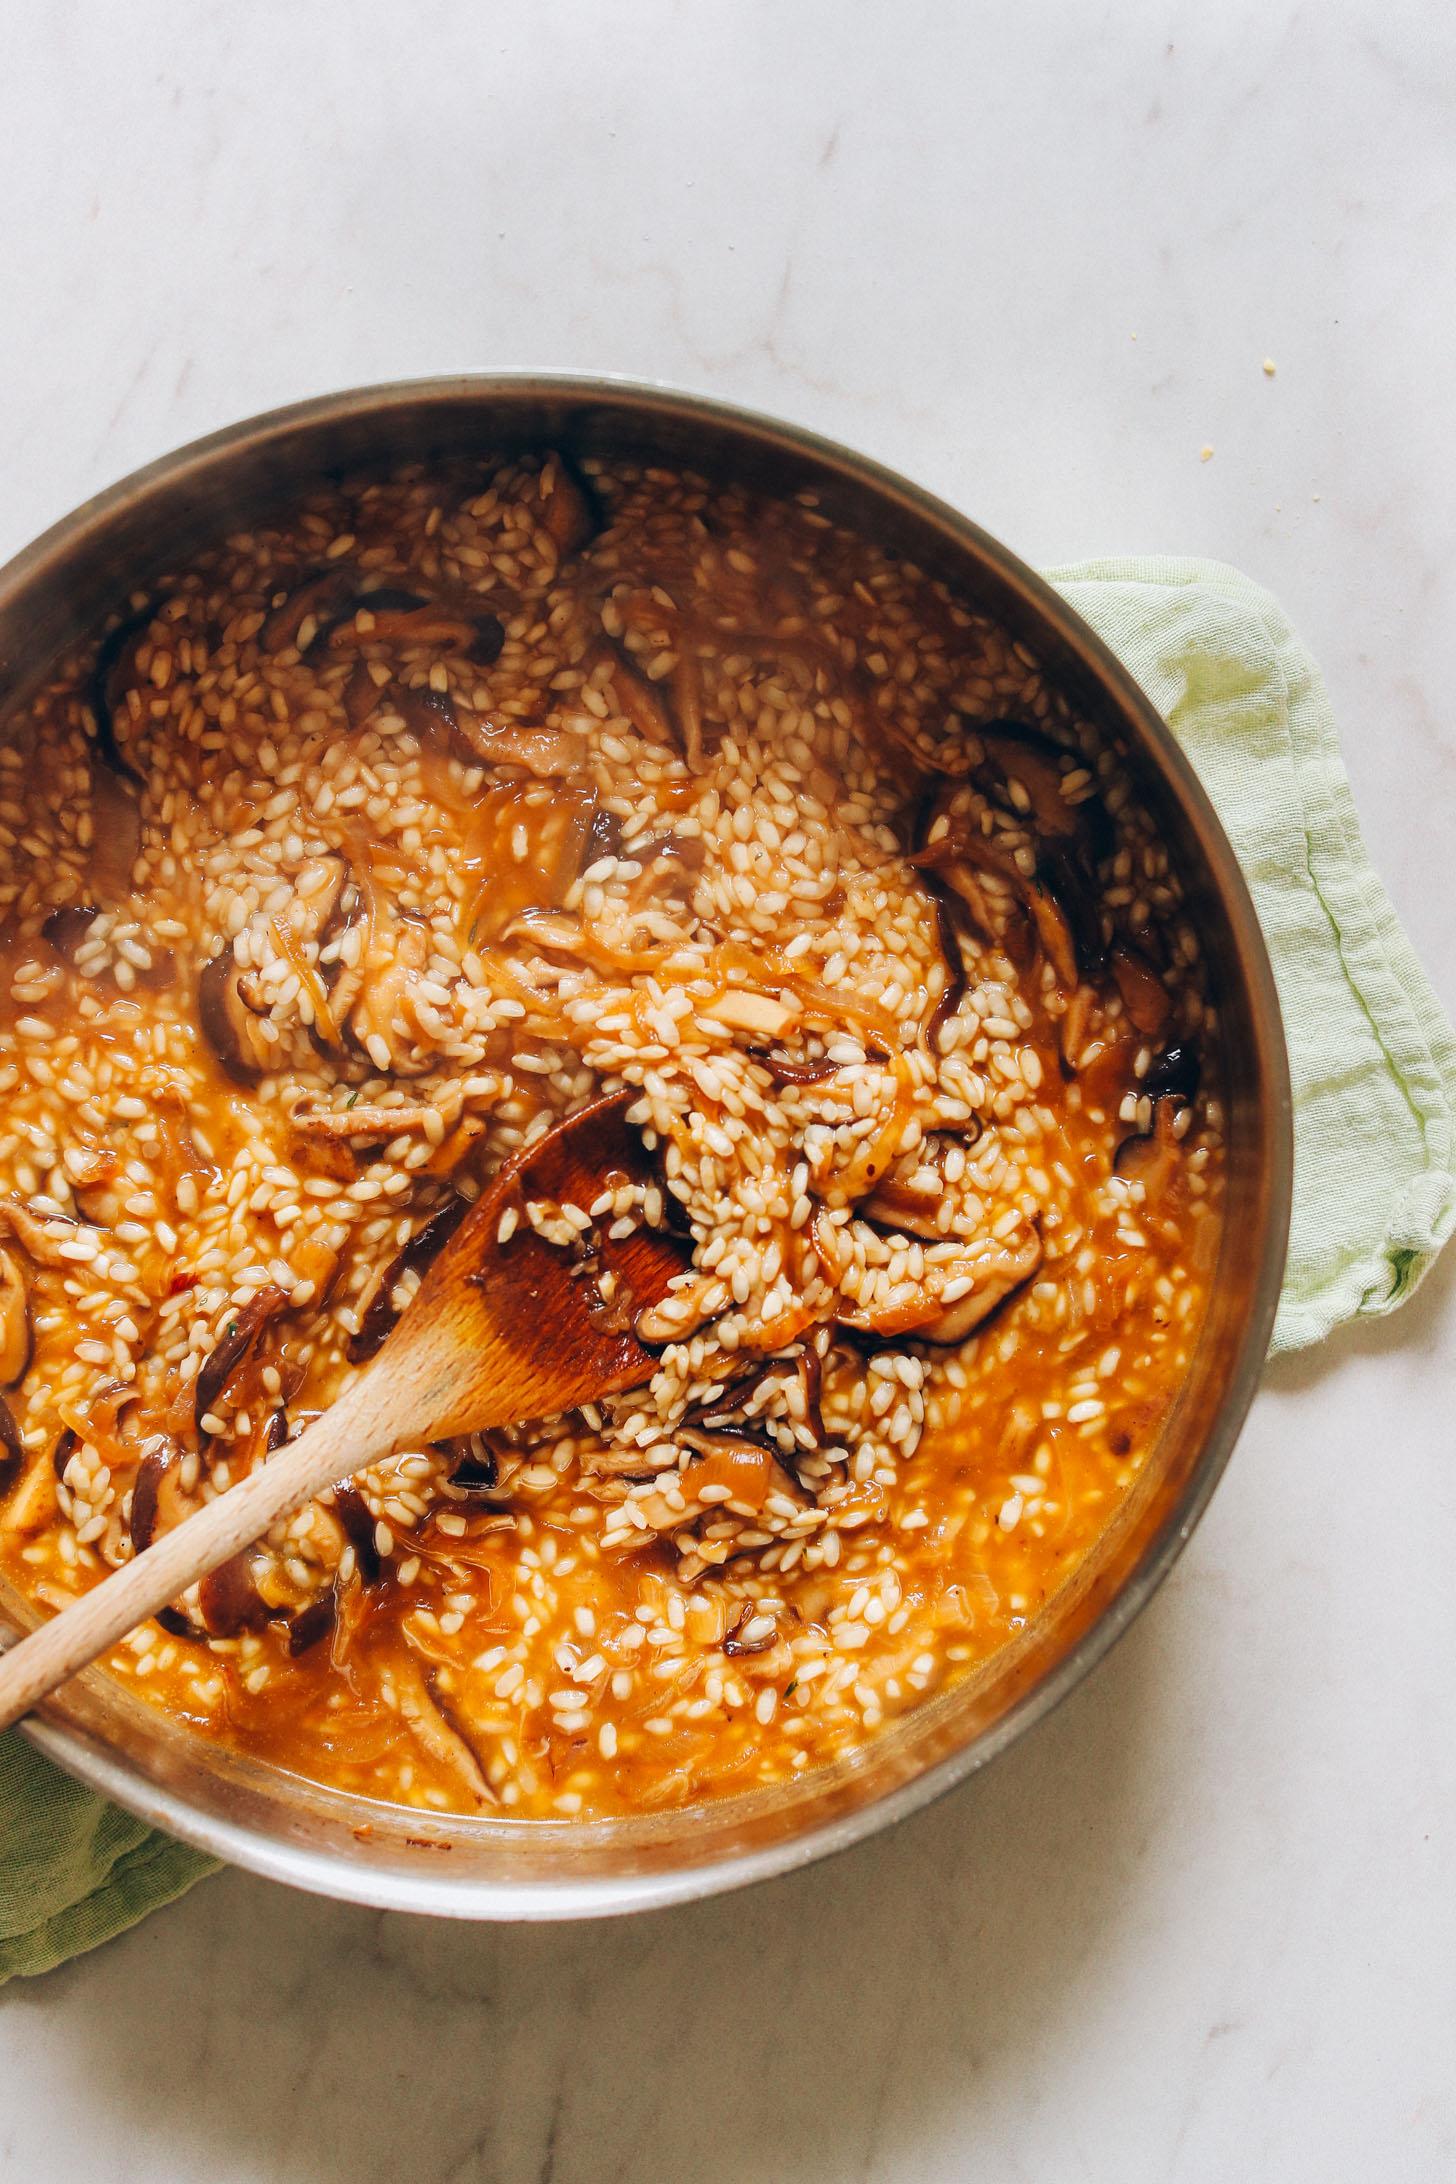 Stirring a batch of our Vegan Caramelized Shiitake Mushroom Risotto recipe